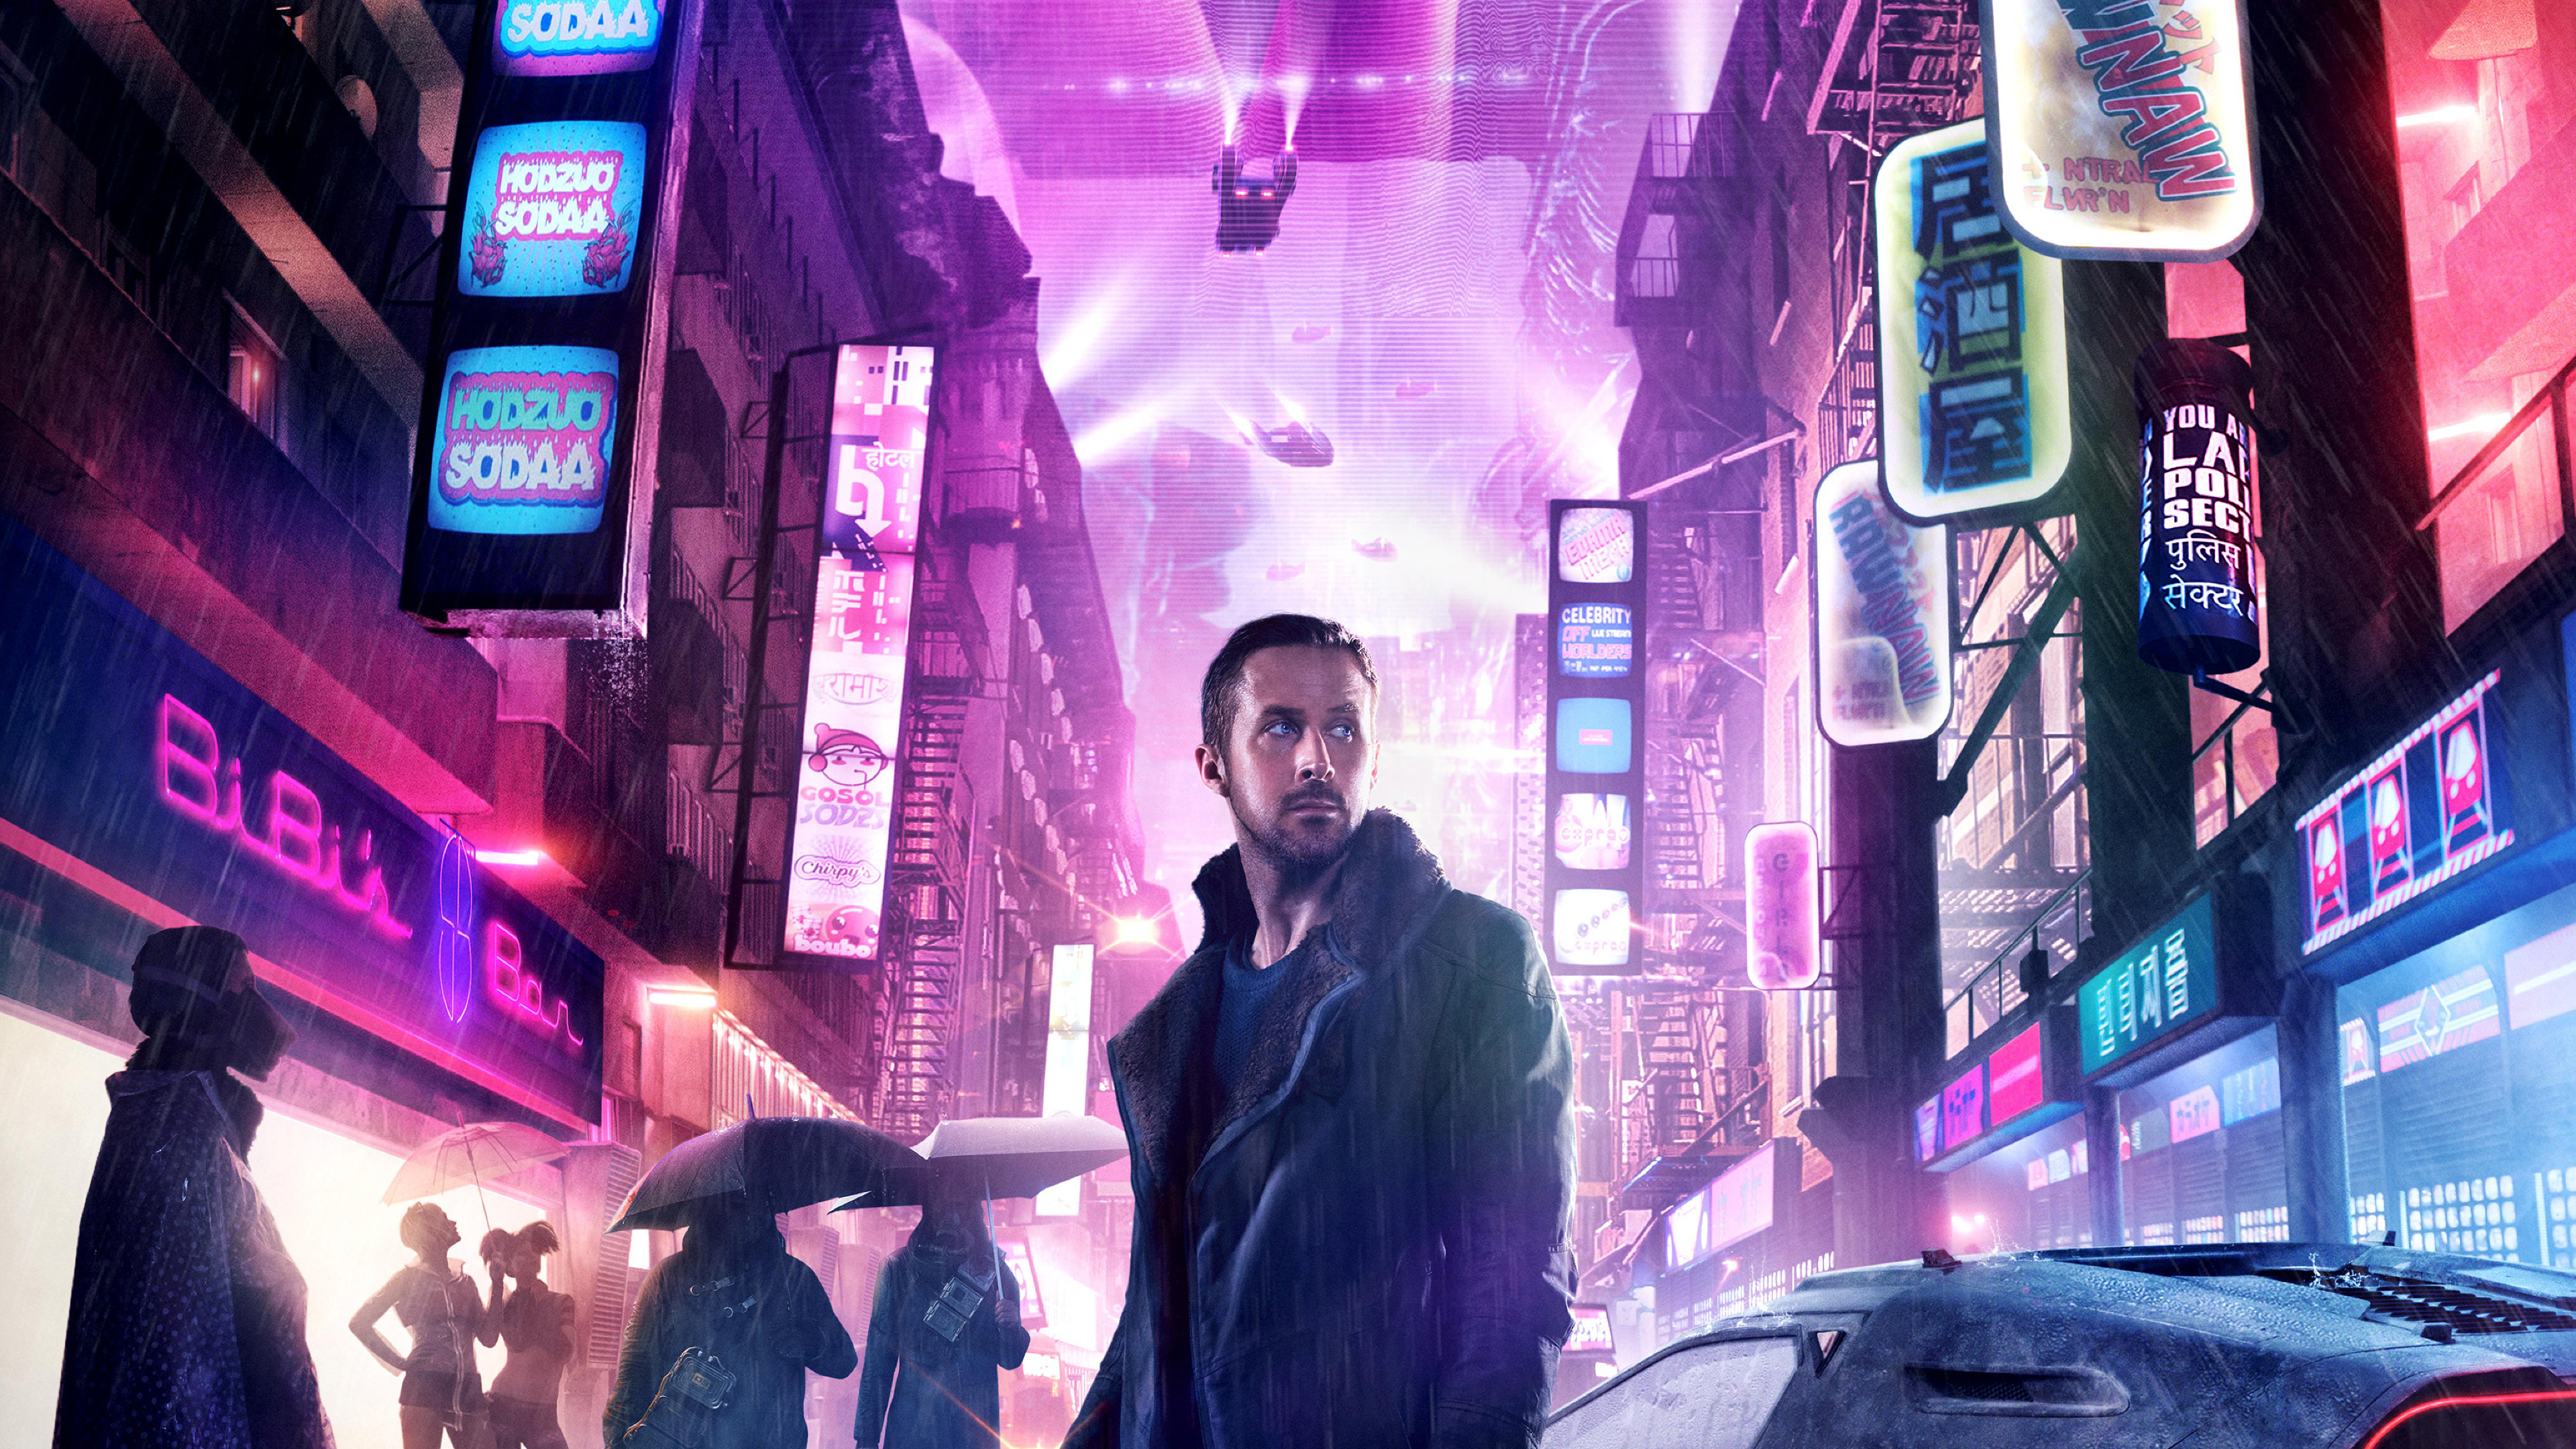 3840x2160 Blade Runner 2049 Movie 4K Wallpaper, HD Movies ...